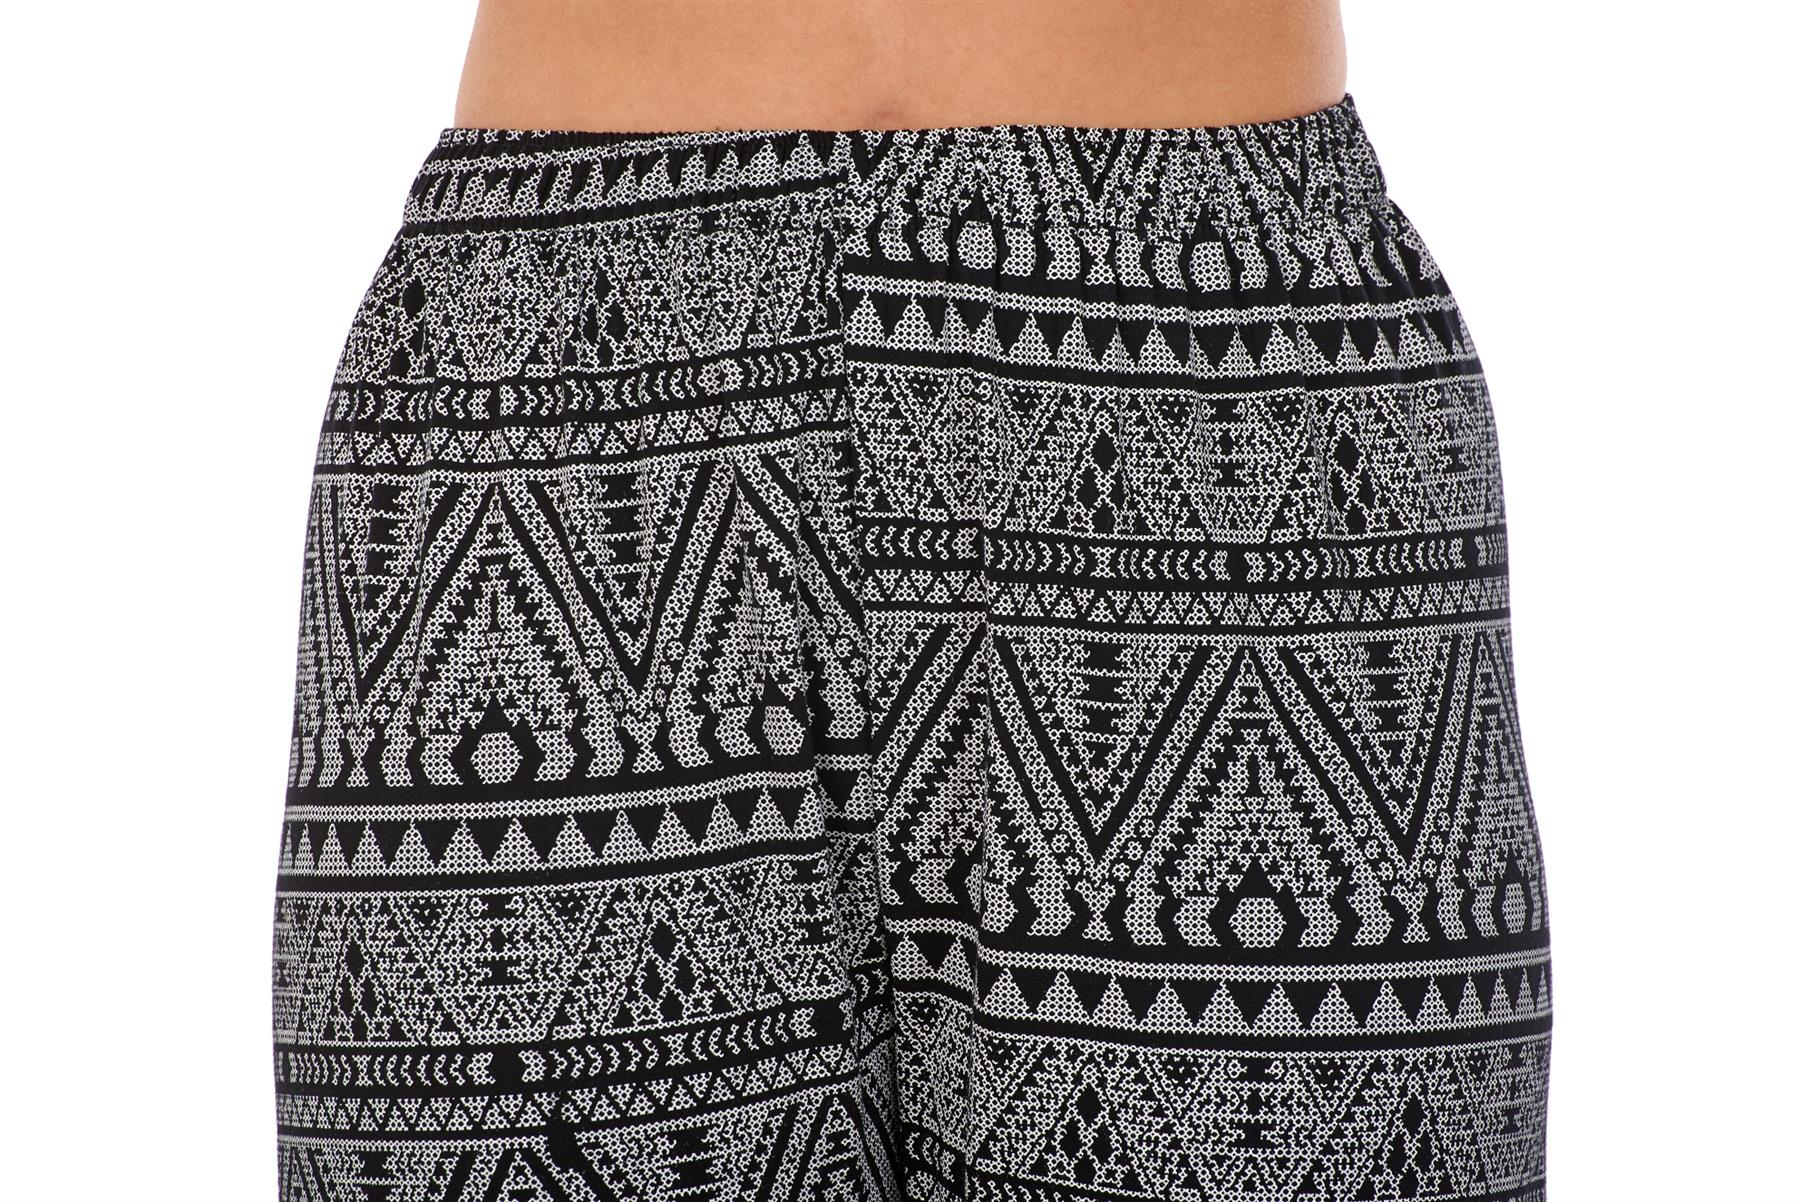 Ladies-Women-Trouser-Elasticated-Printed-Tapered-Harem-High-waist-Regular-Pants thumbnail 13